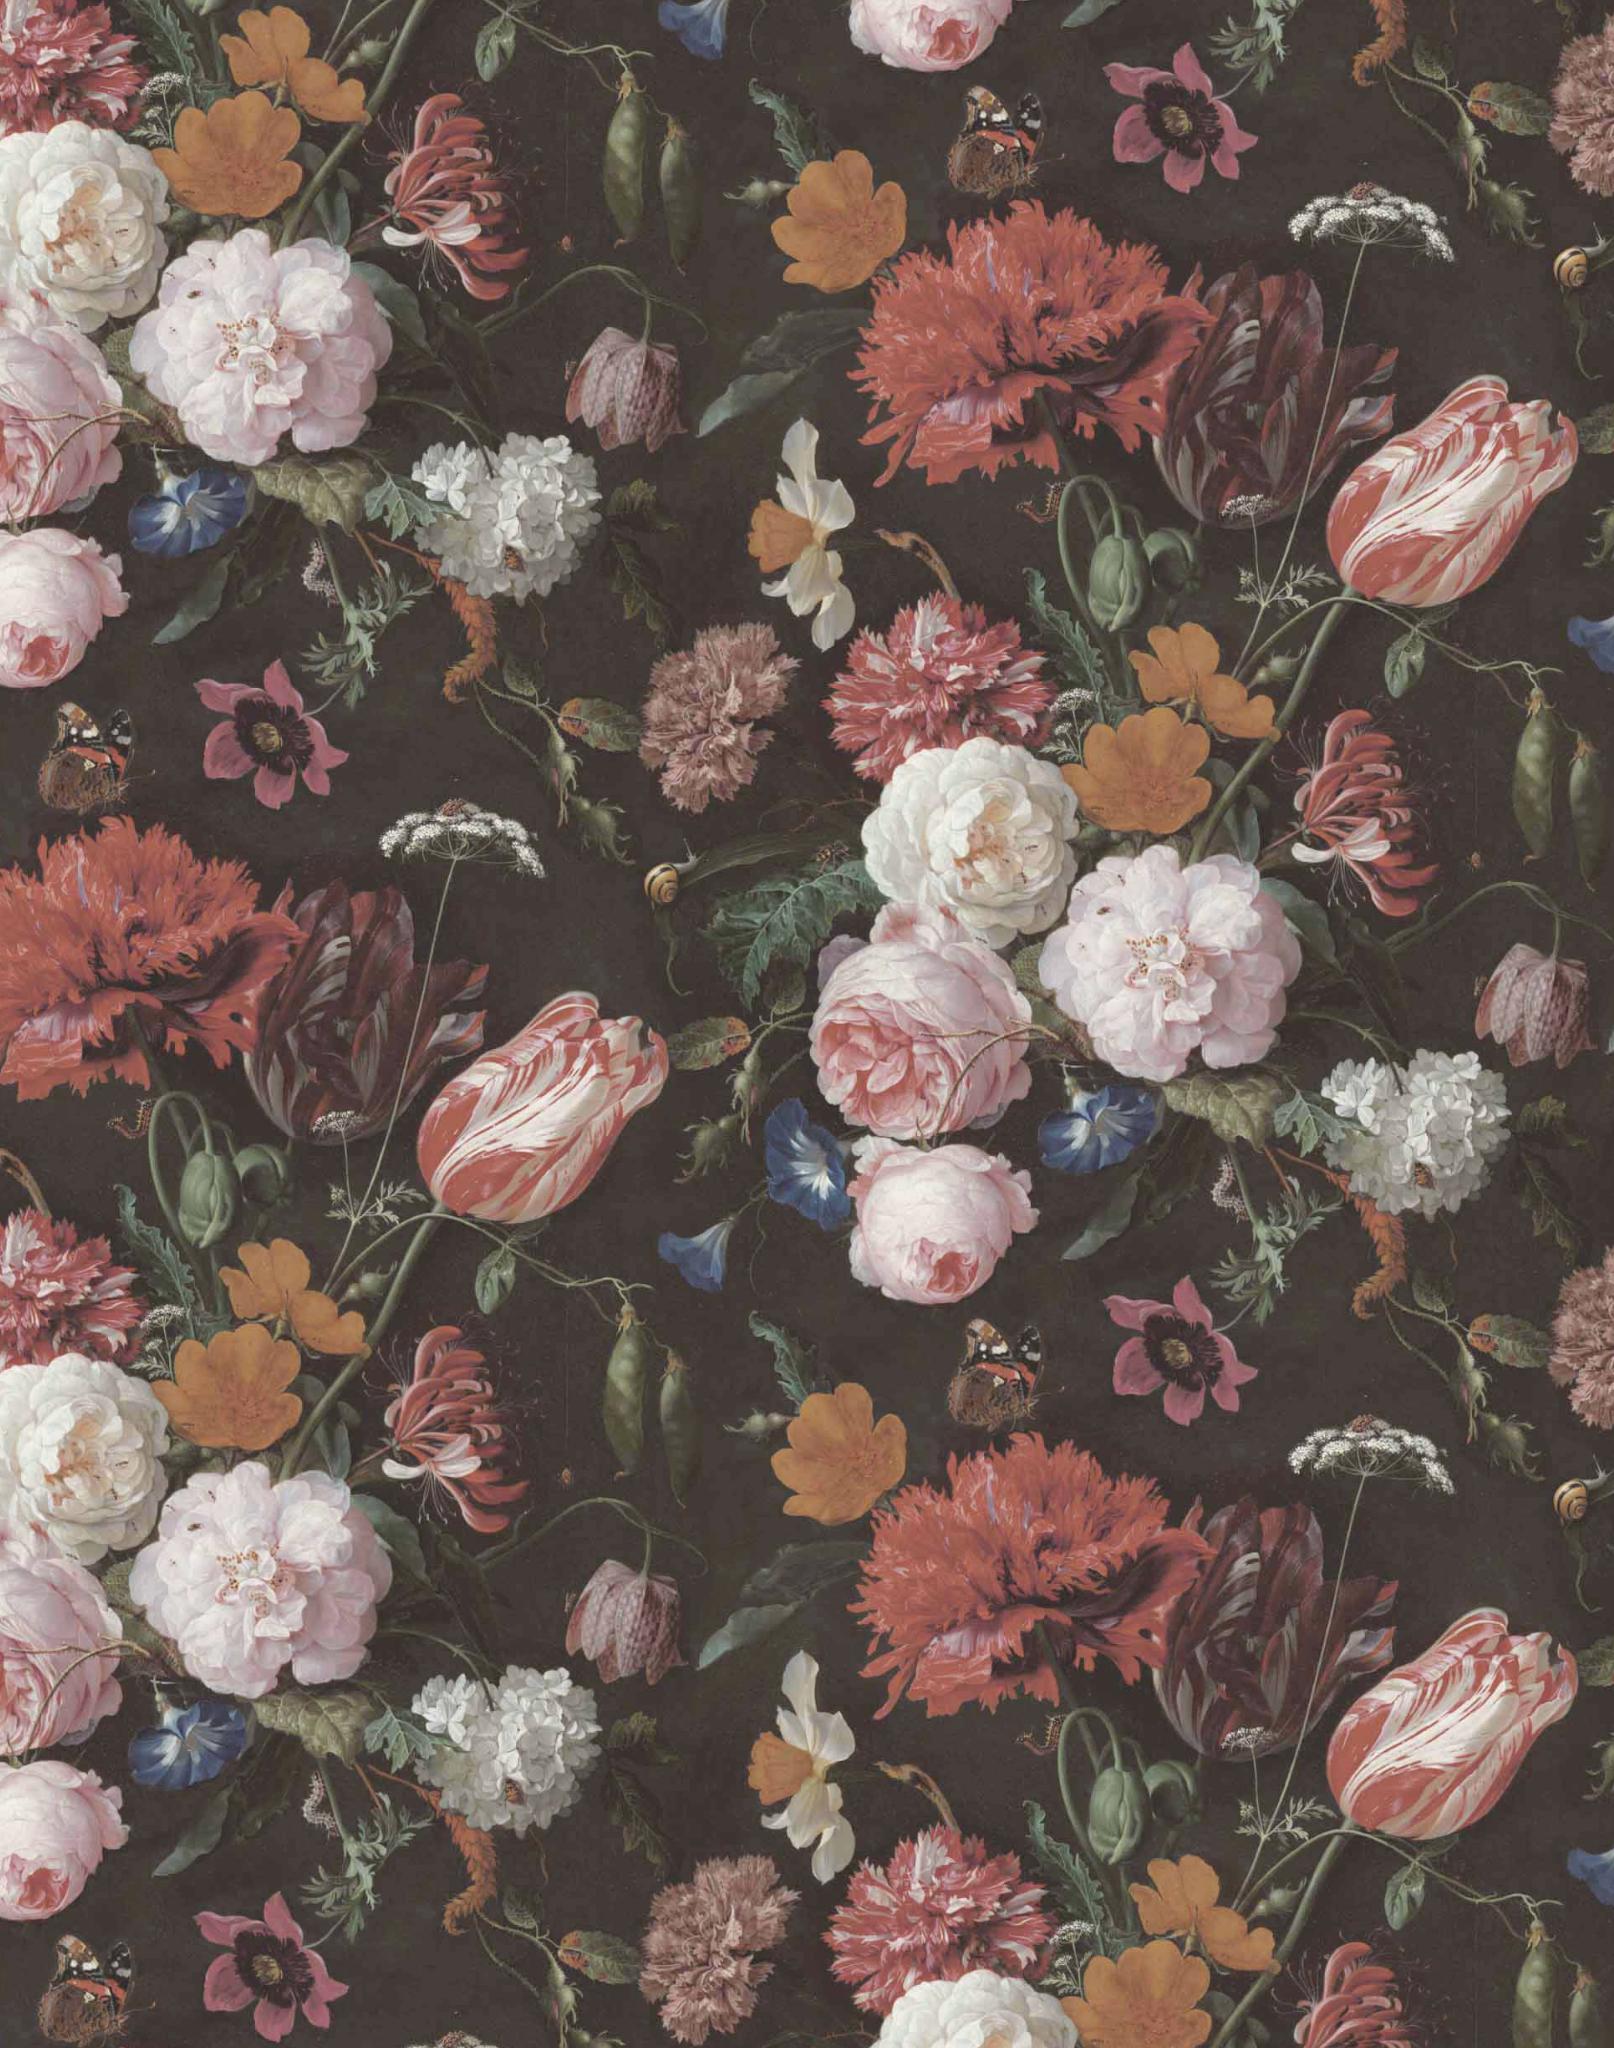 Dutch Floral - Sample